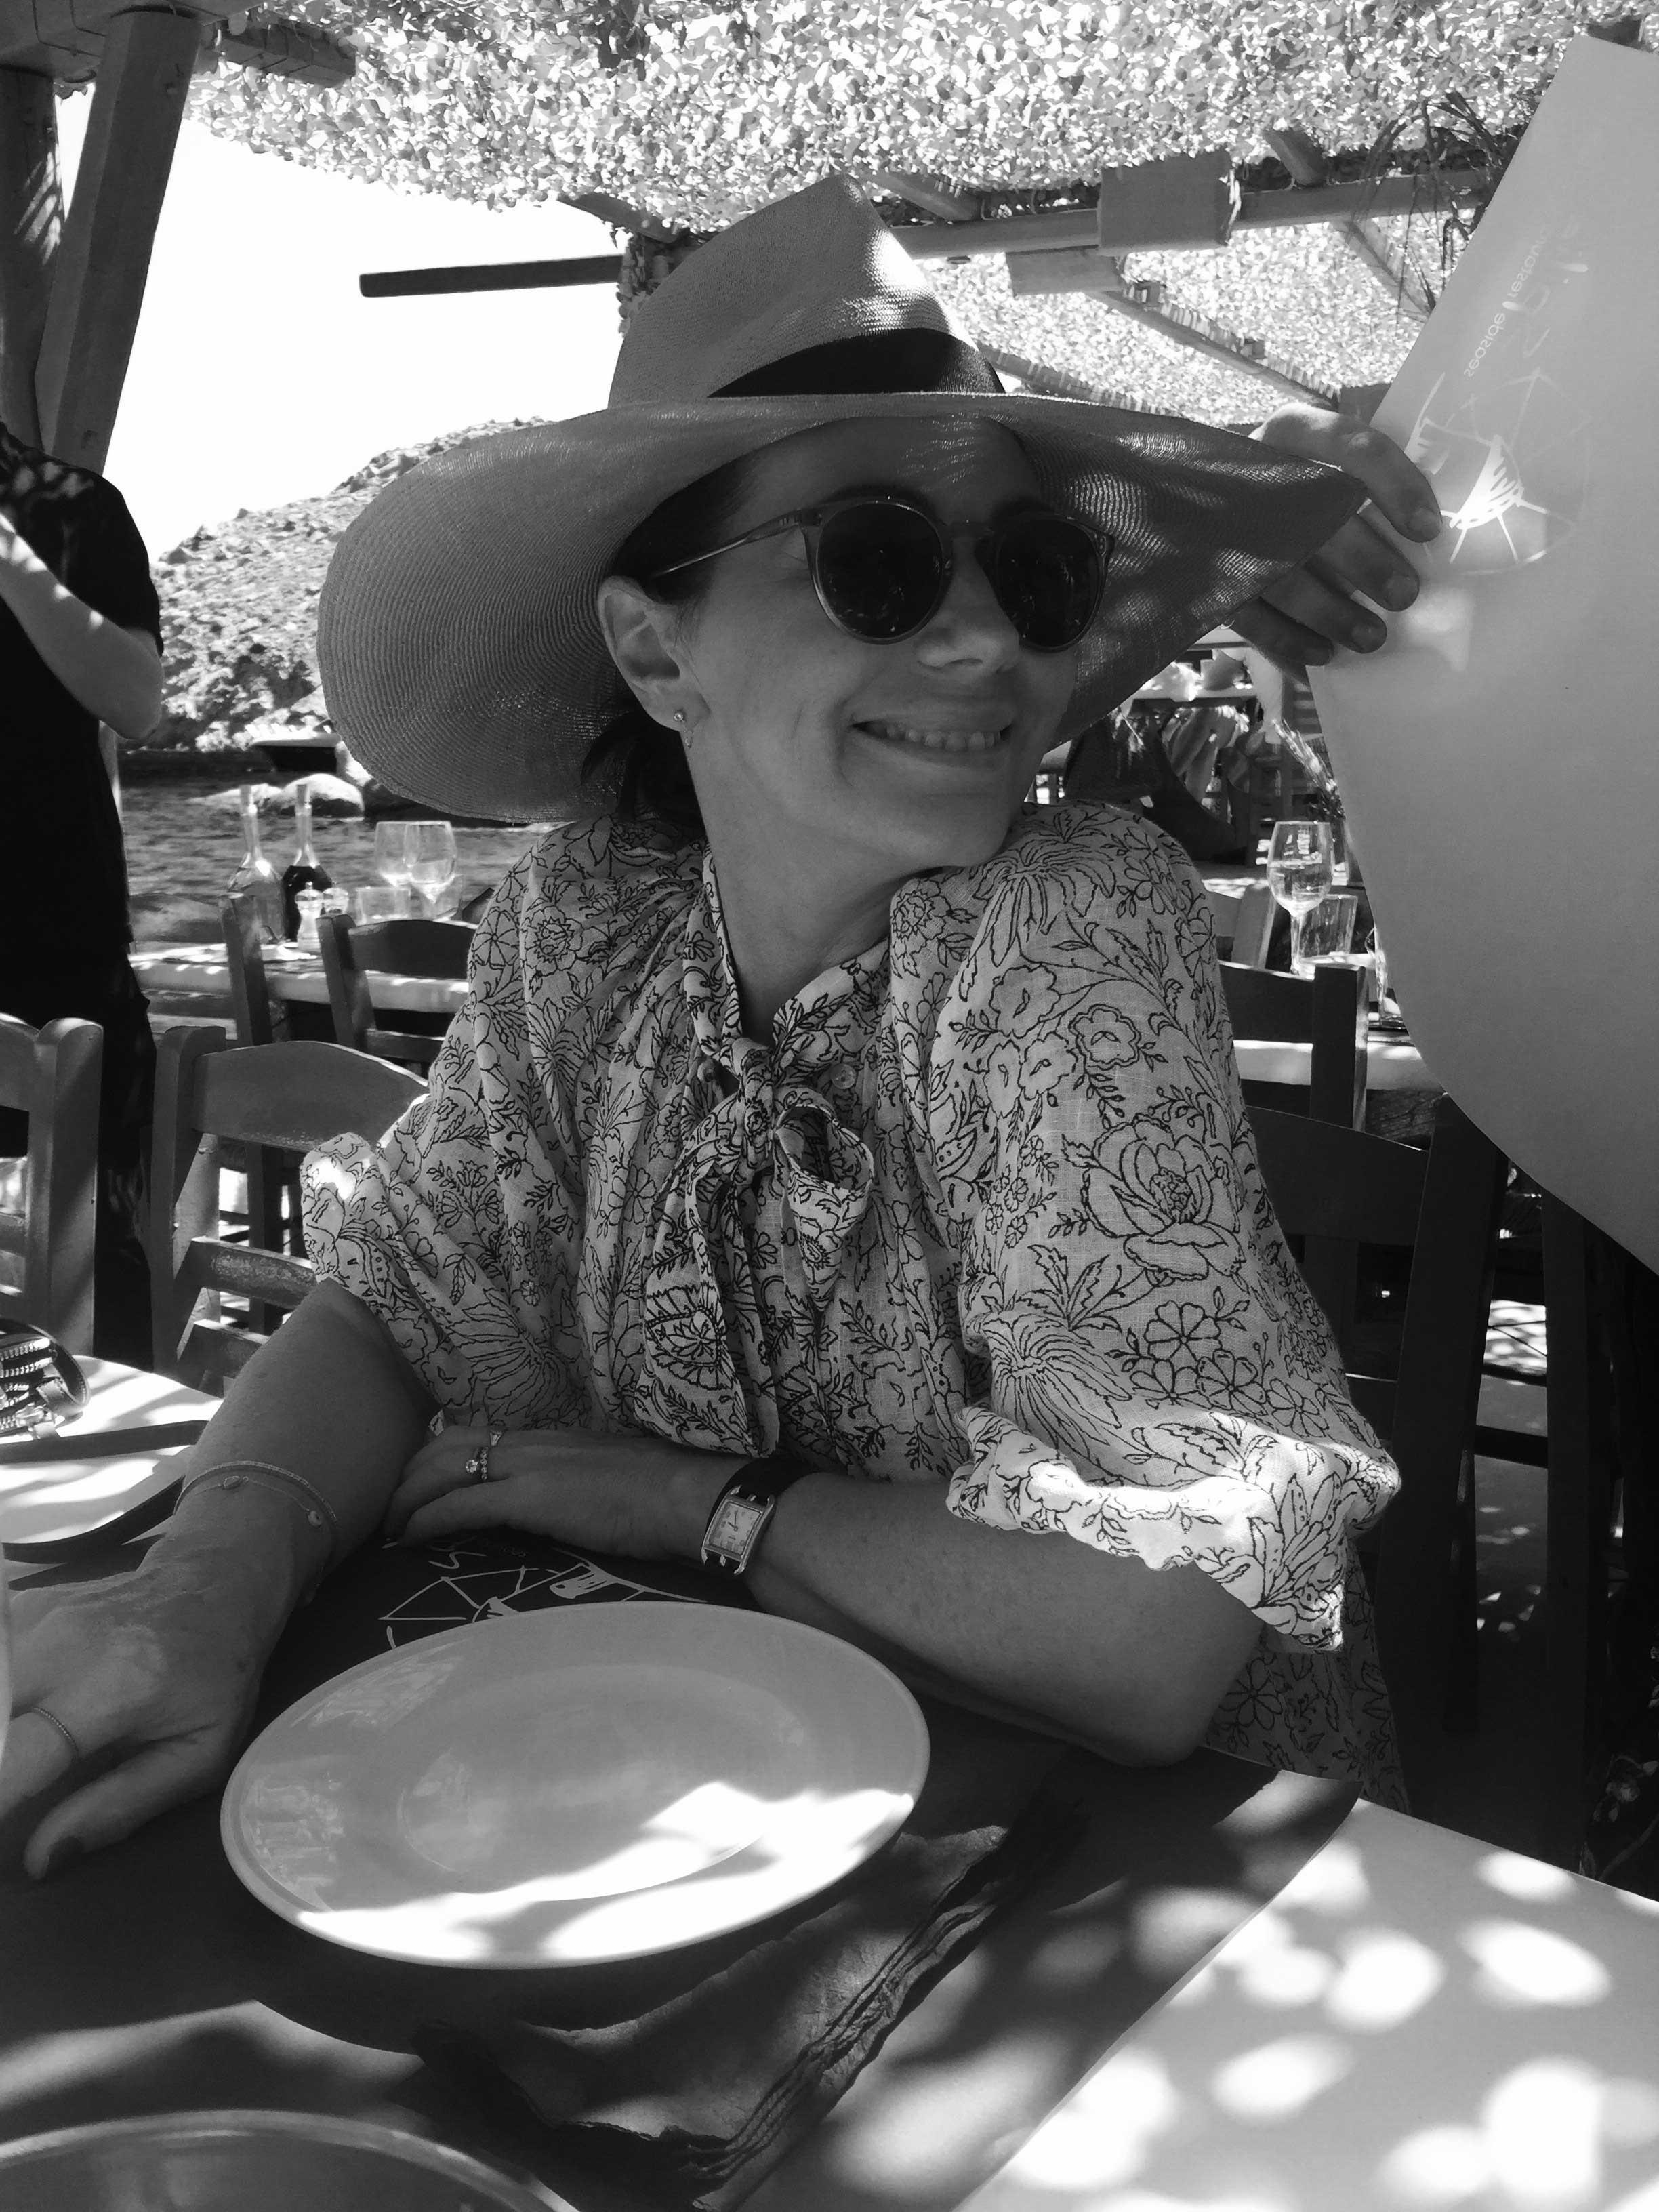 Nicky Zimmermann enjoying lunch at Spilia. July 2016